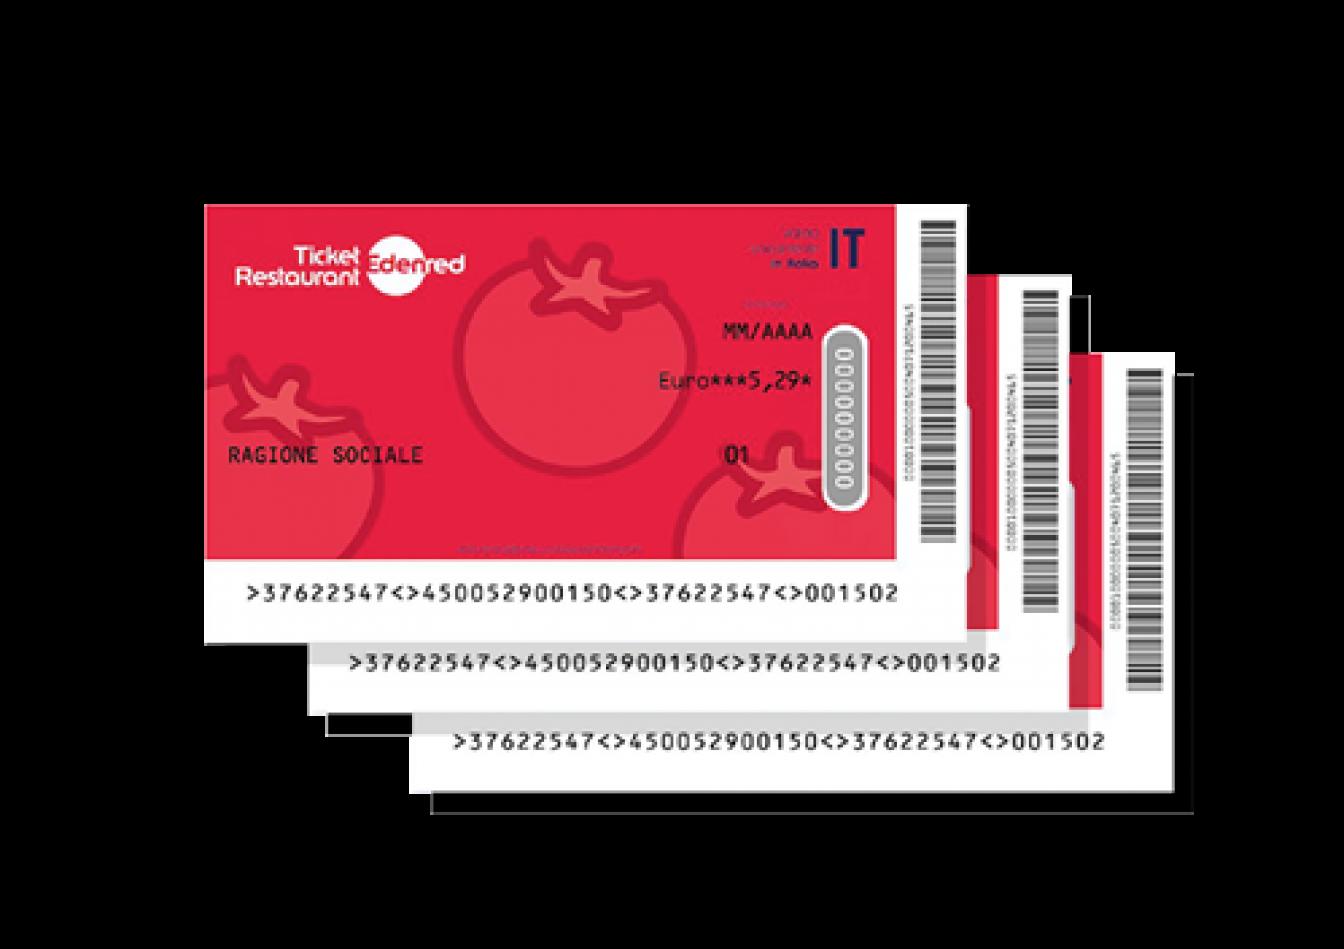 buono-pasto-carteceo-ticket-restaurant-box-202105